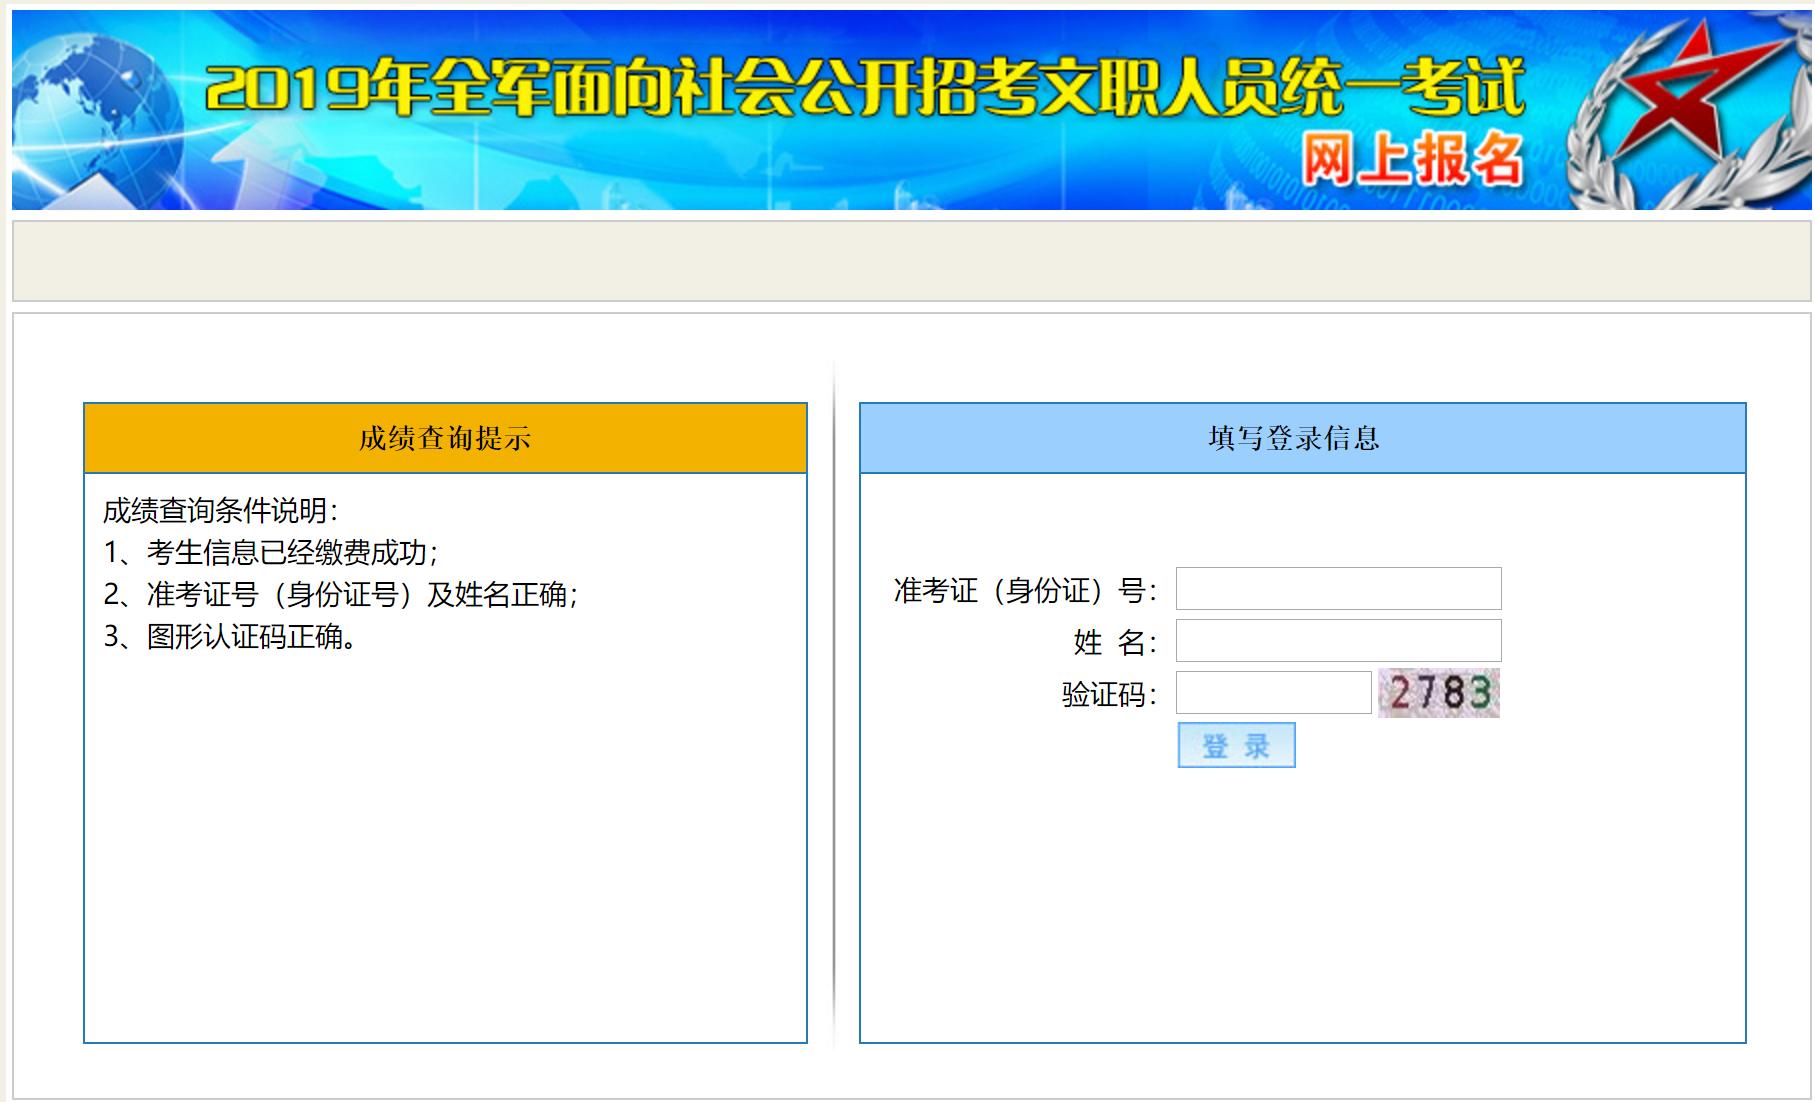 http://www.elejy.com/shishangchaoliu/6165.html